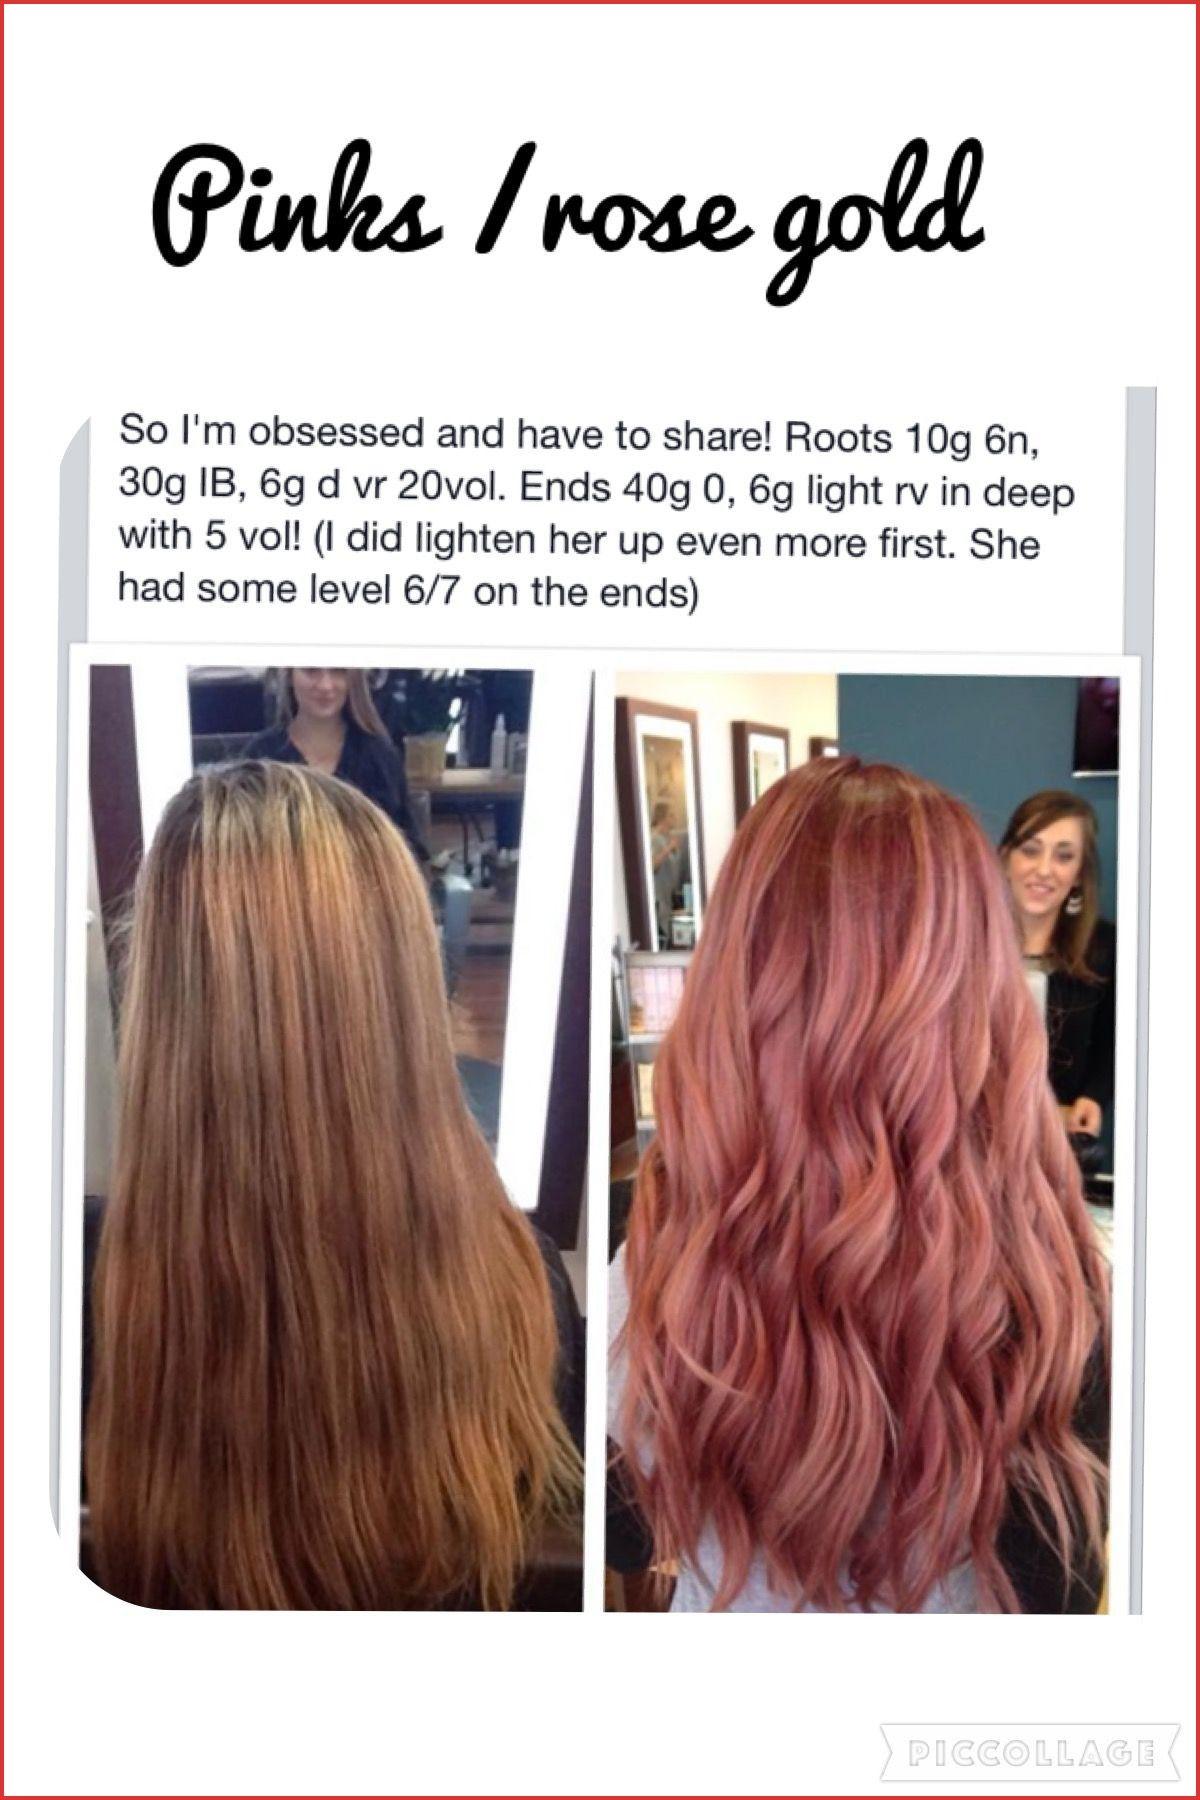 Aveda Hair Color Review 144649 Rose Dÿœ Gold Hair Colors Pinterest Hair Color Formulas Aveda Hair Color Hair Color Reviews